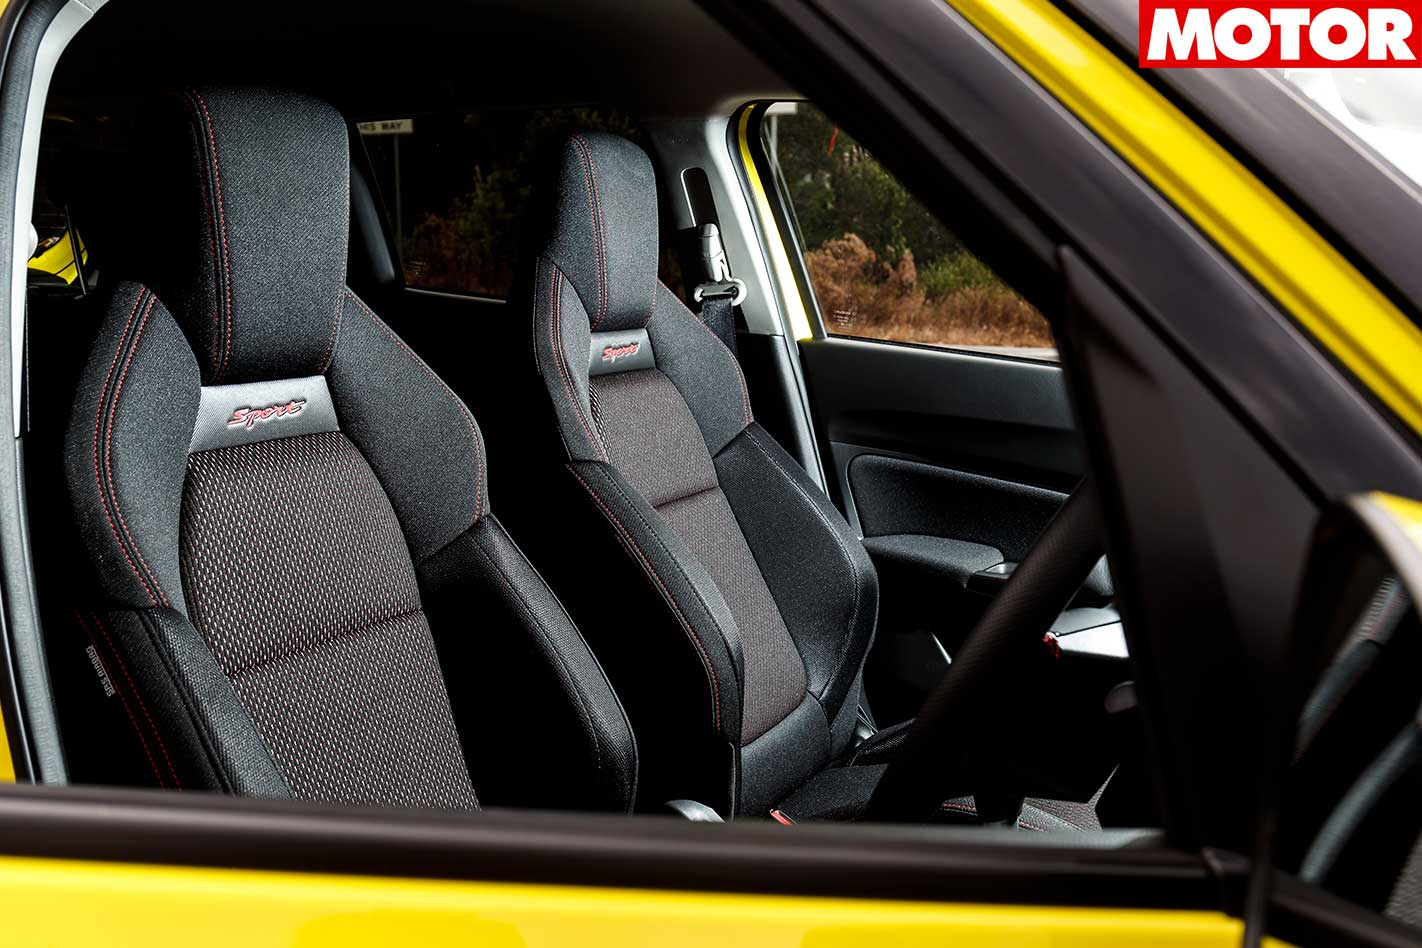 2018 Suzuki Swift Sport Seats